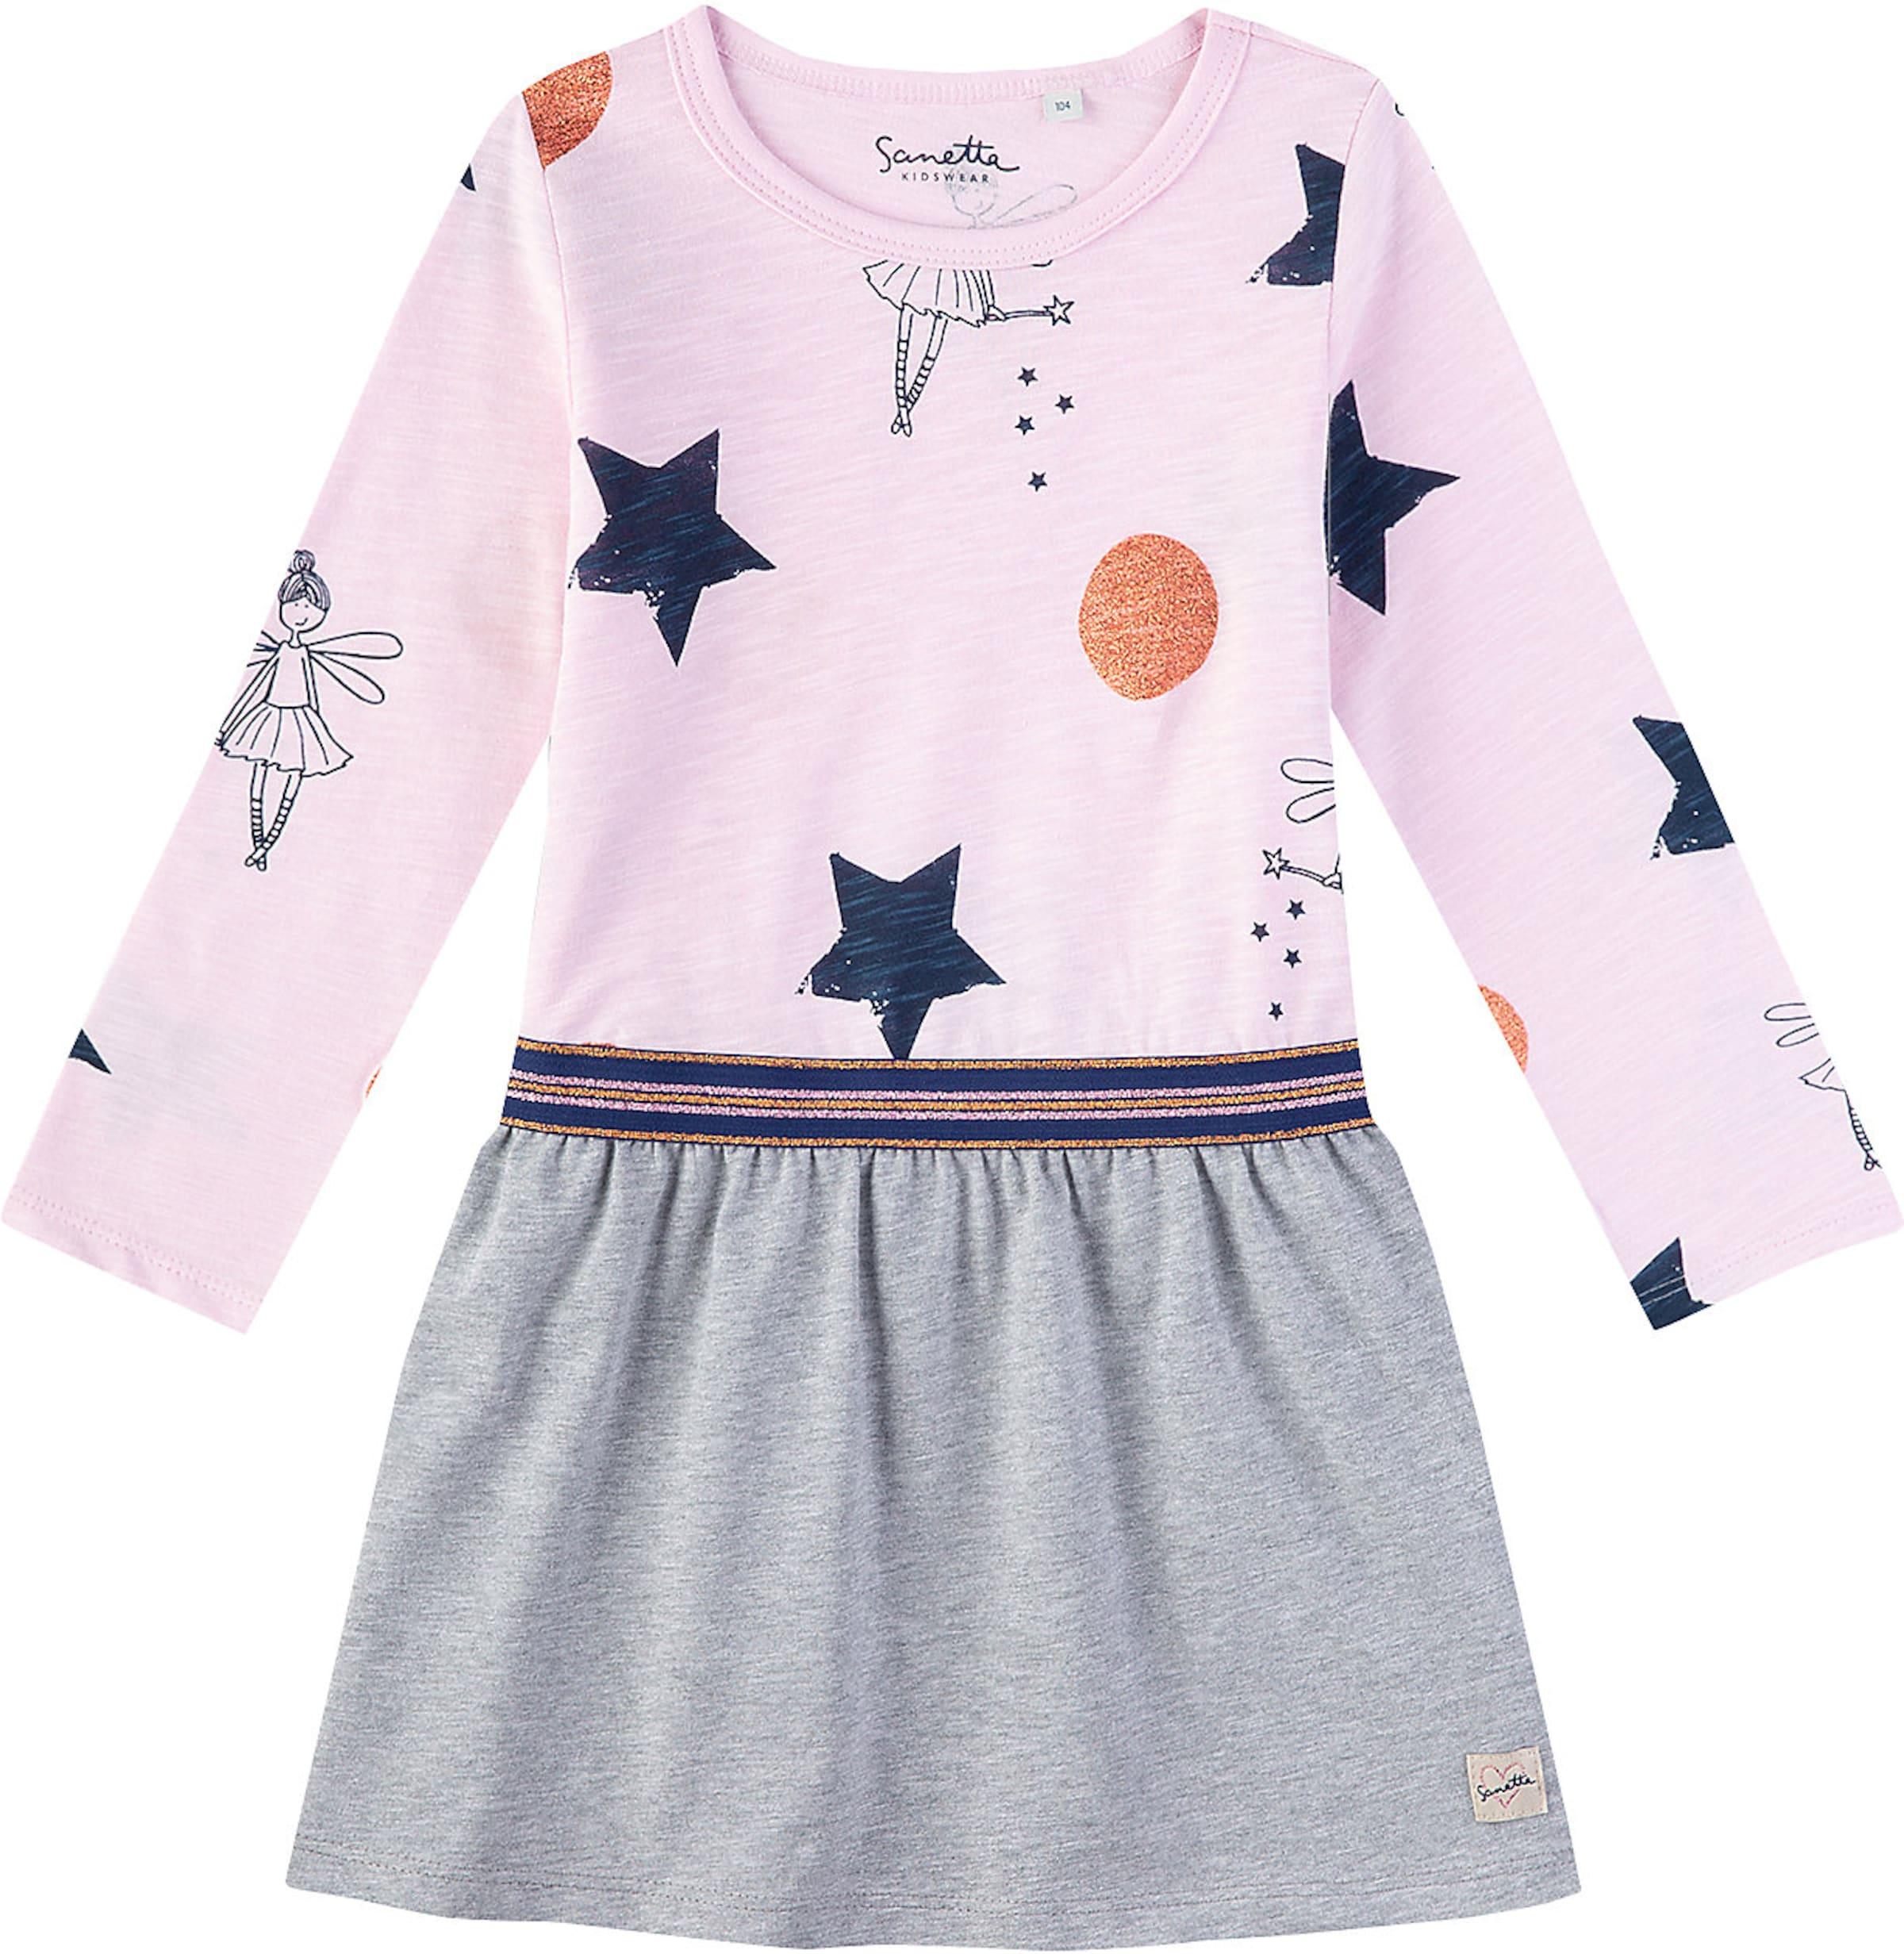 Kinder,  Mädchen,  Kinder Sanetta Kidswear Kleid 'Fee' blau,  grau,  rosa | 04055502976724